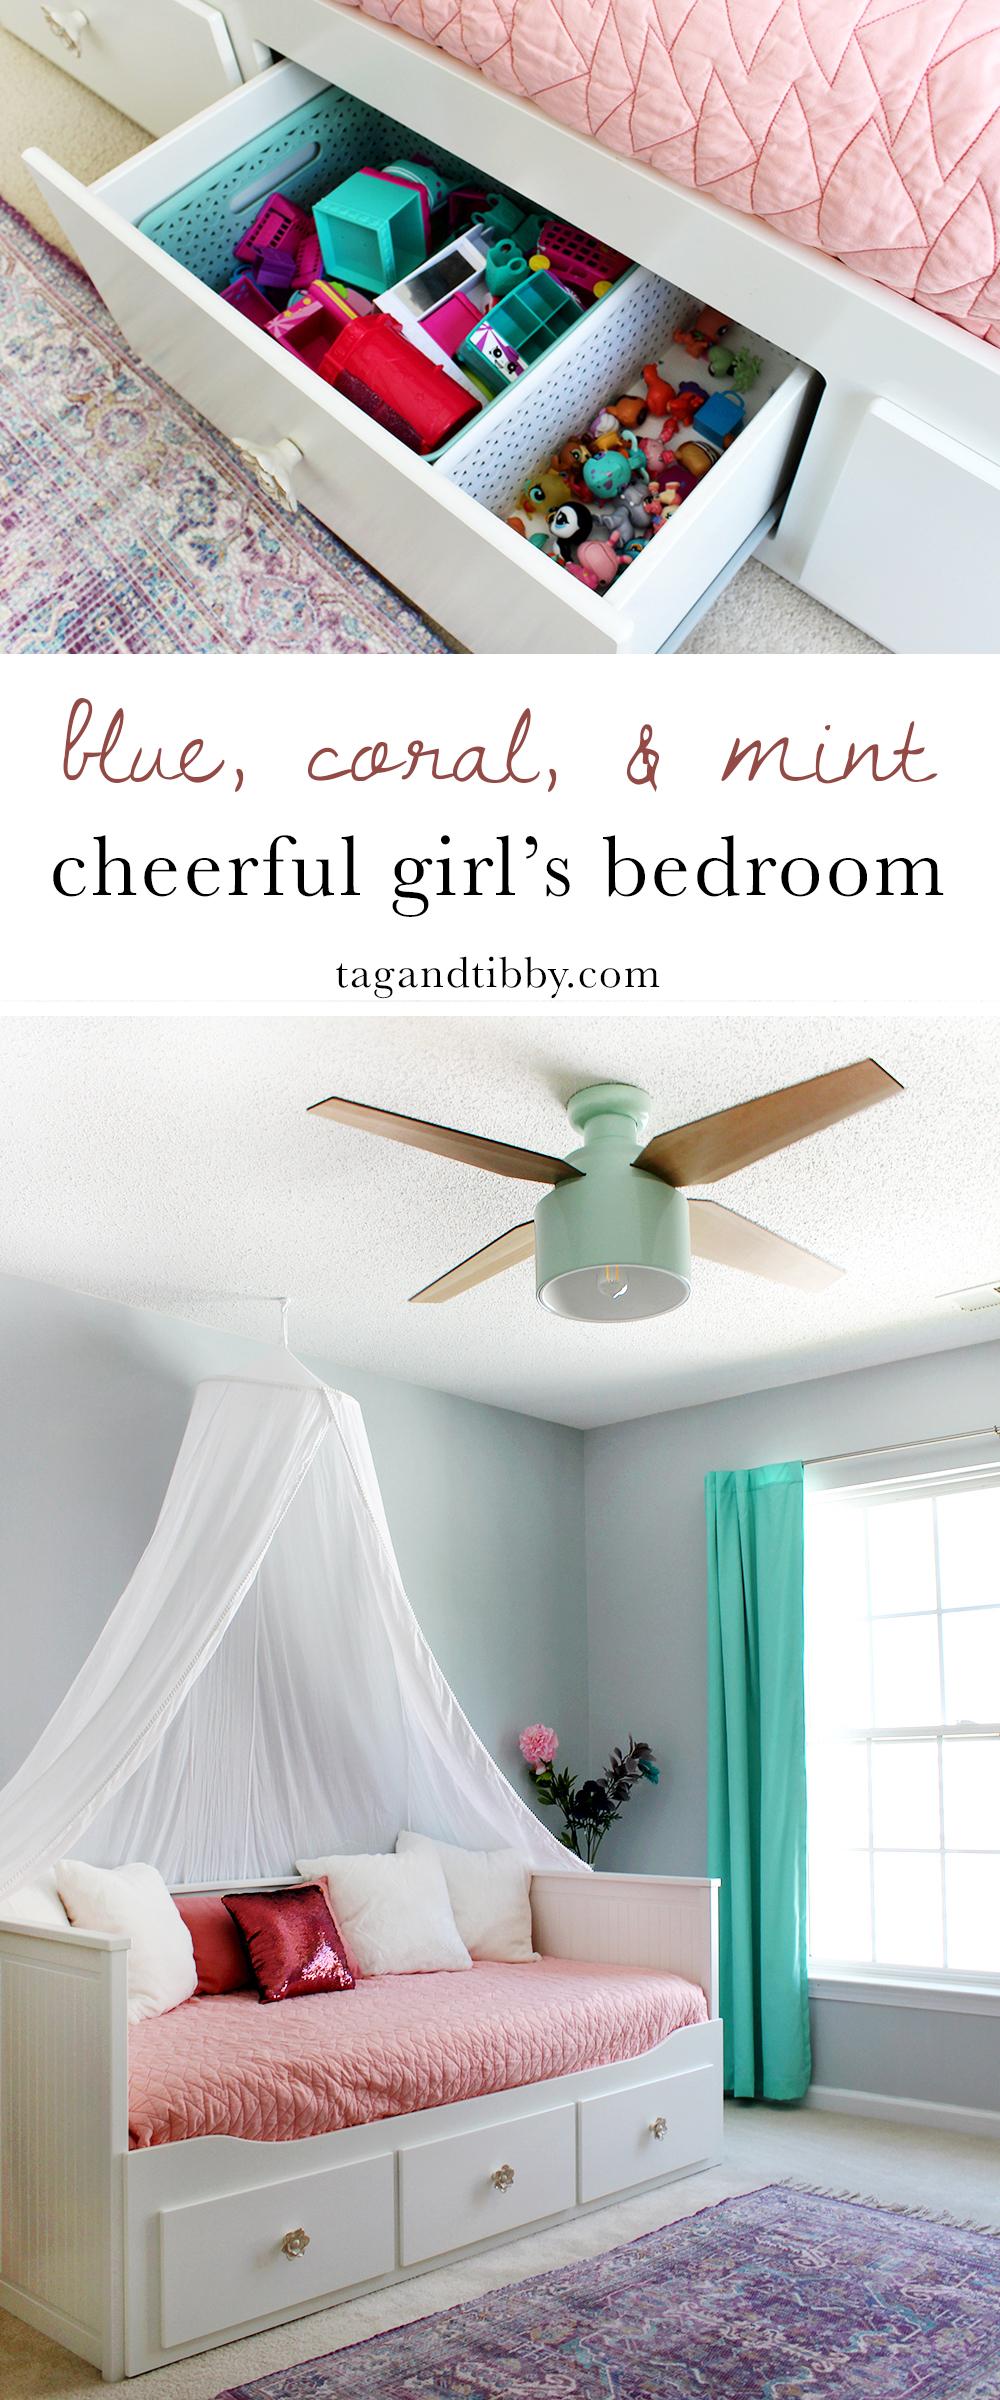 cheerful girl's bedroom in SW Misty blue paint & Cranbrook ceiling fan